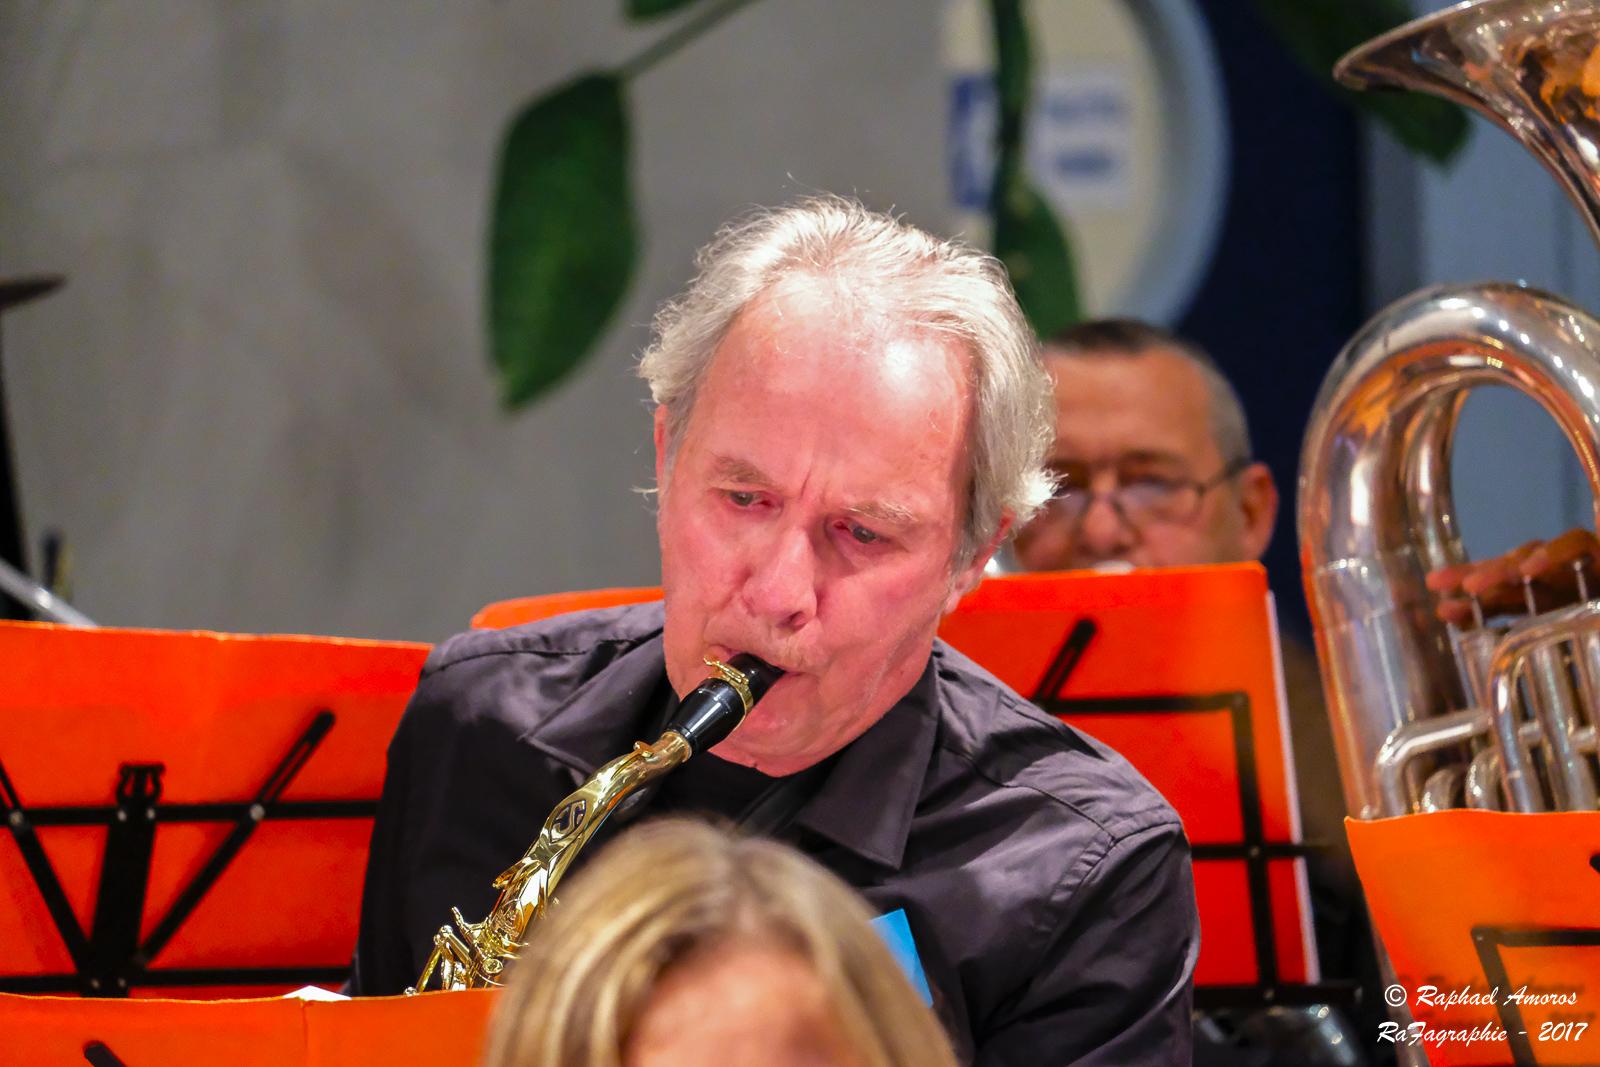 Harmonie Saint-Péray Saint-Peray 07130 Orchestre RaFagraphie Concert